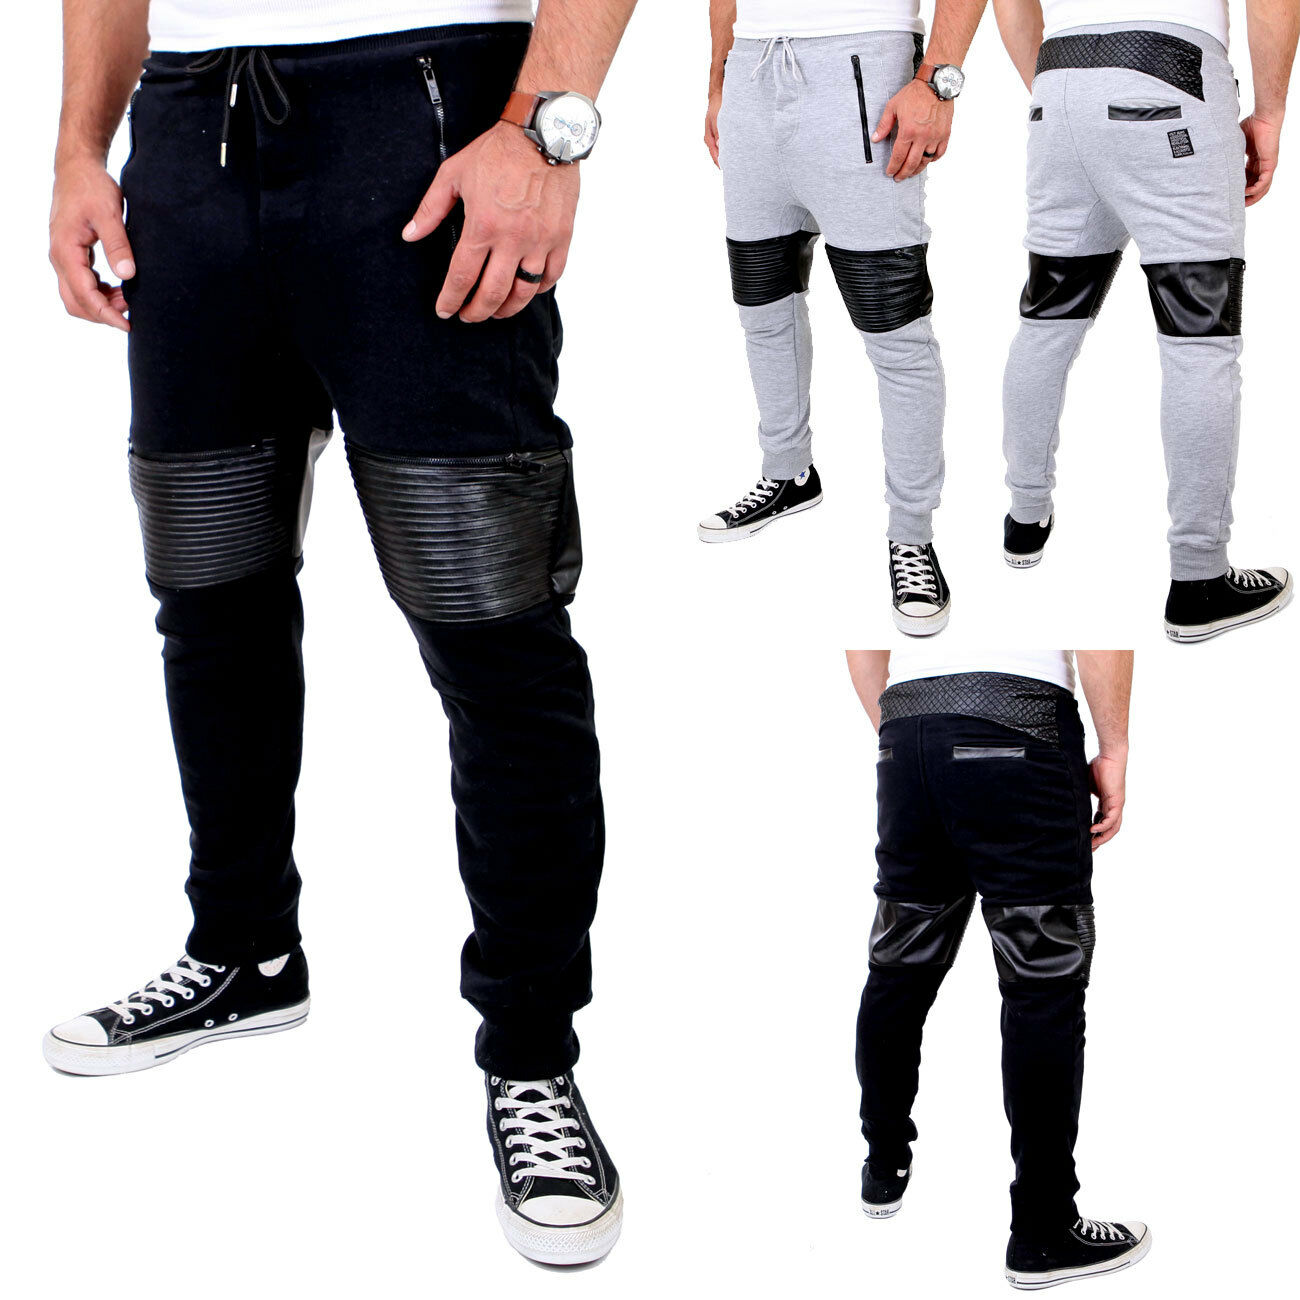 Vsct Clubwear jogging pantalon messieurs Faible Crougech Biker biceps Jogger v-5641434